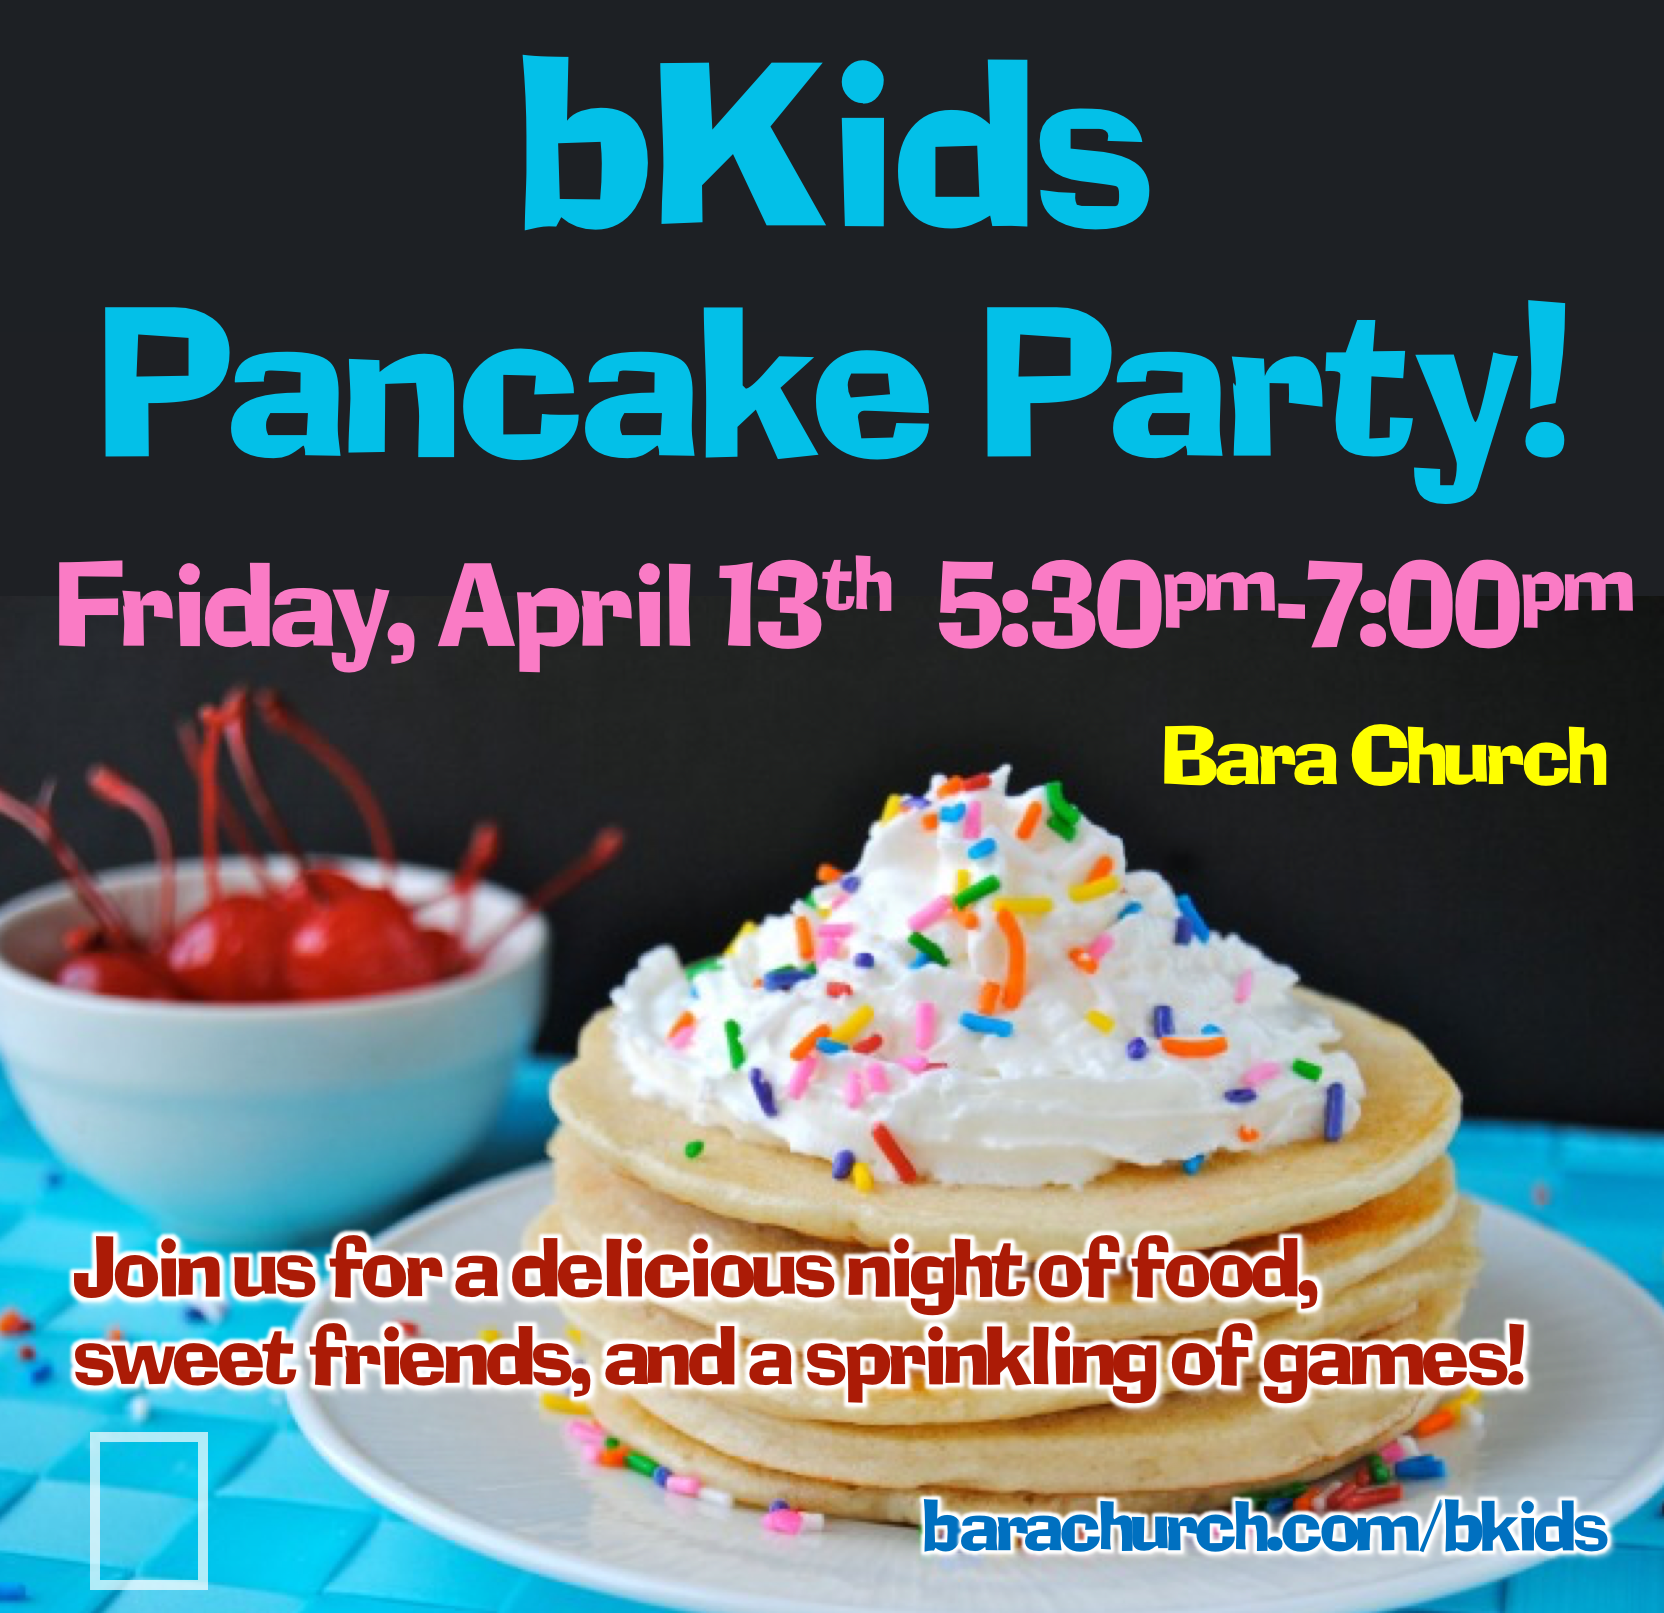 bKids Pancake Party Square 2.png